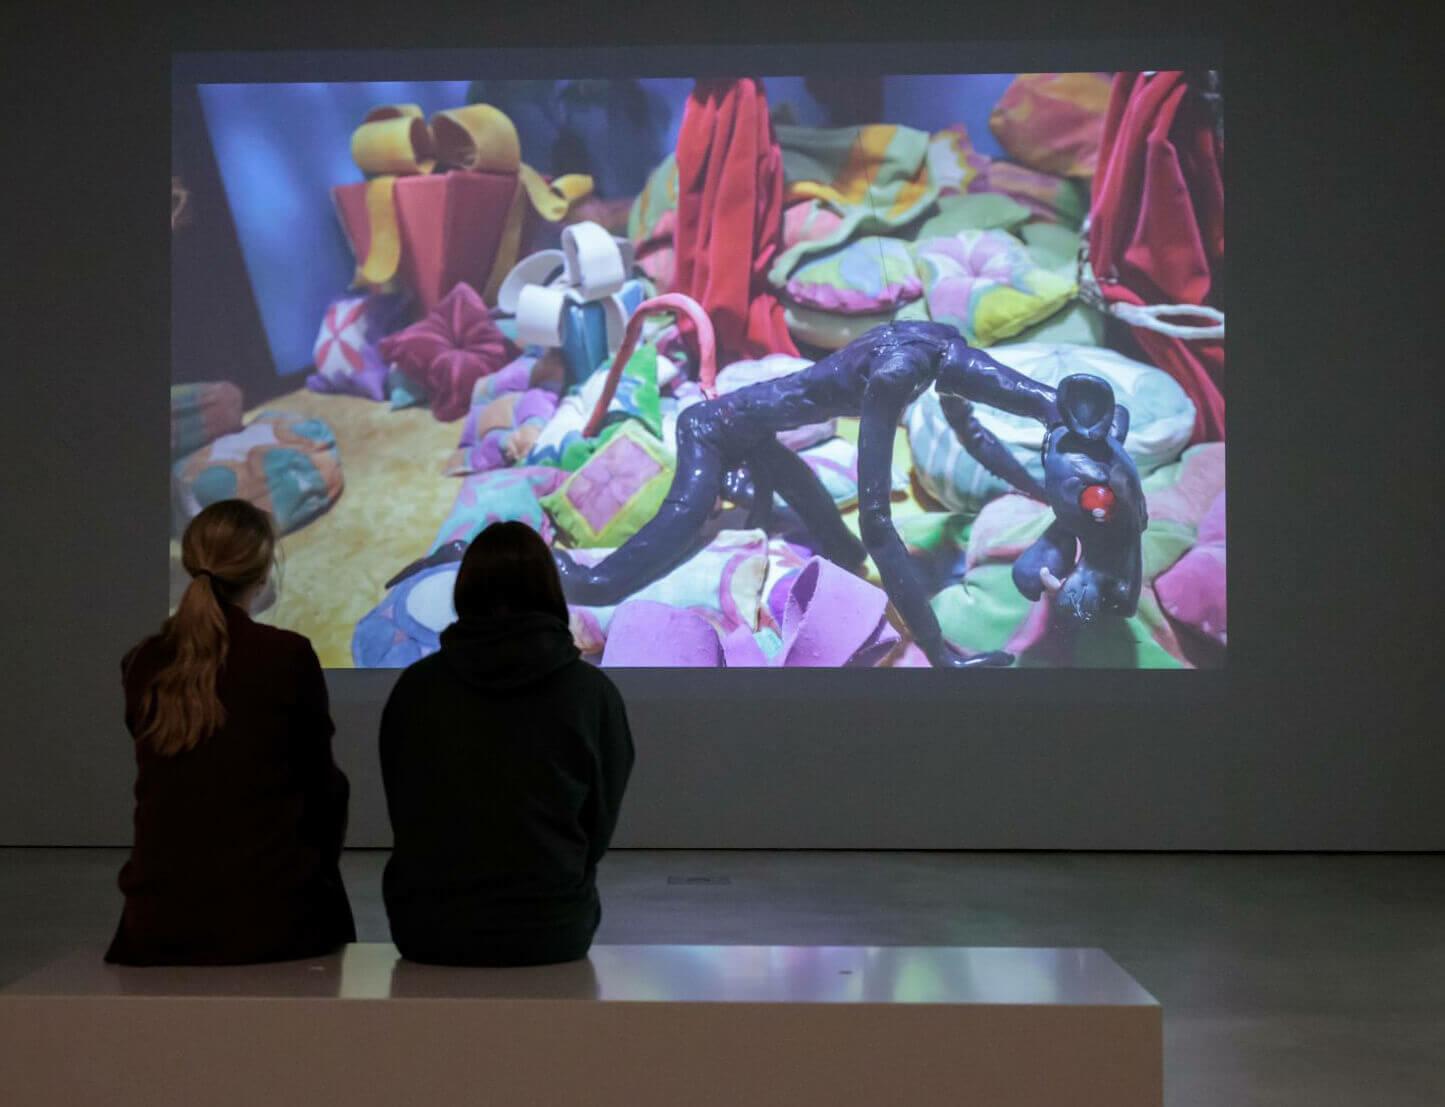 Djurberg & Berg on view at Kunstmuseum Ravensburg